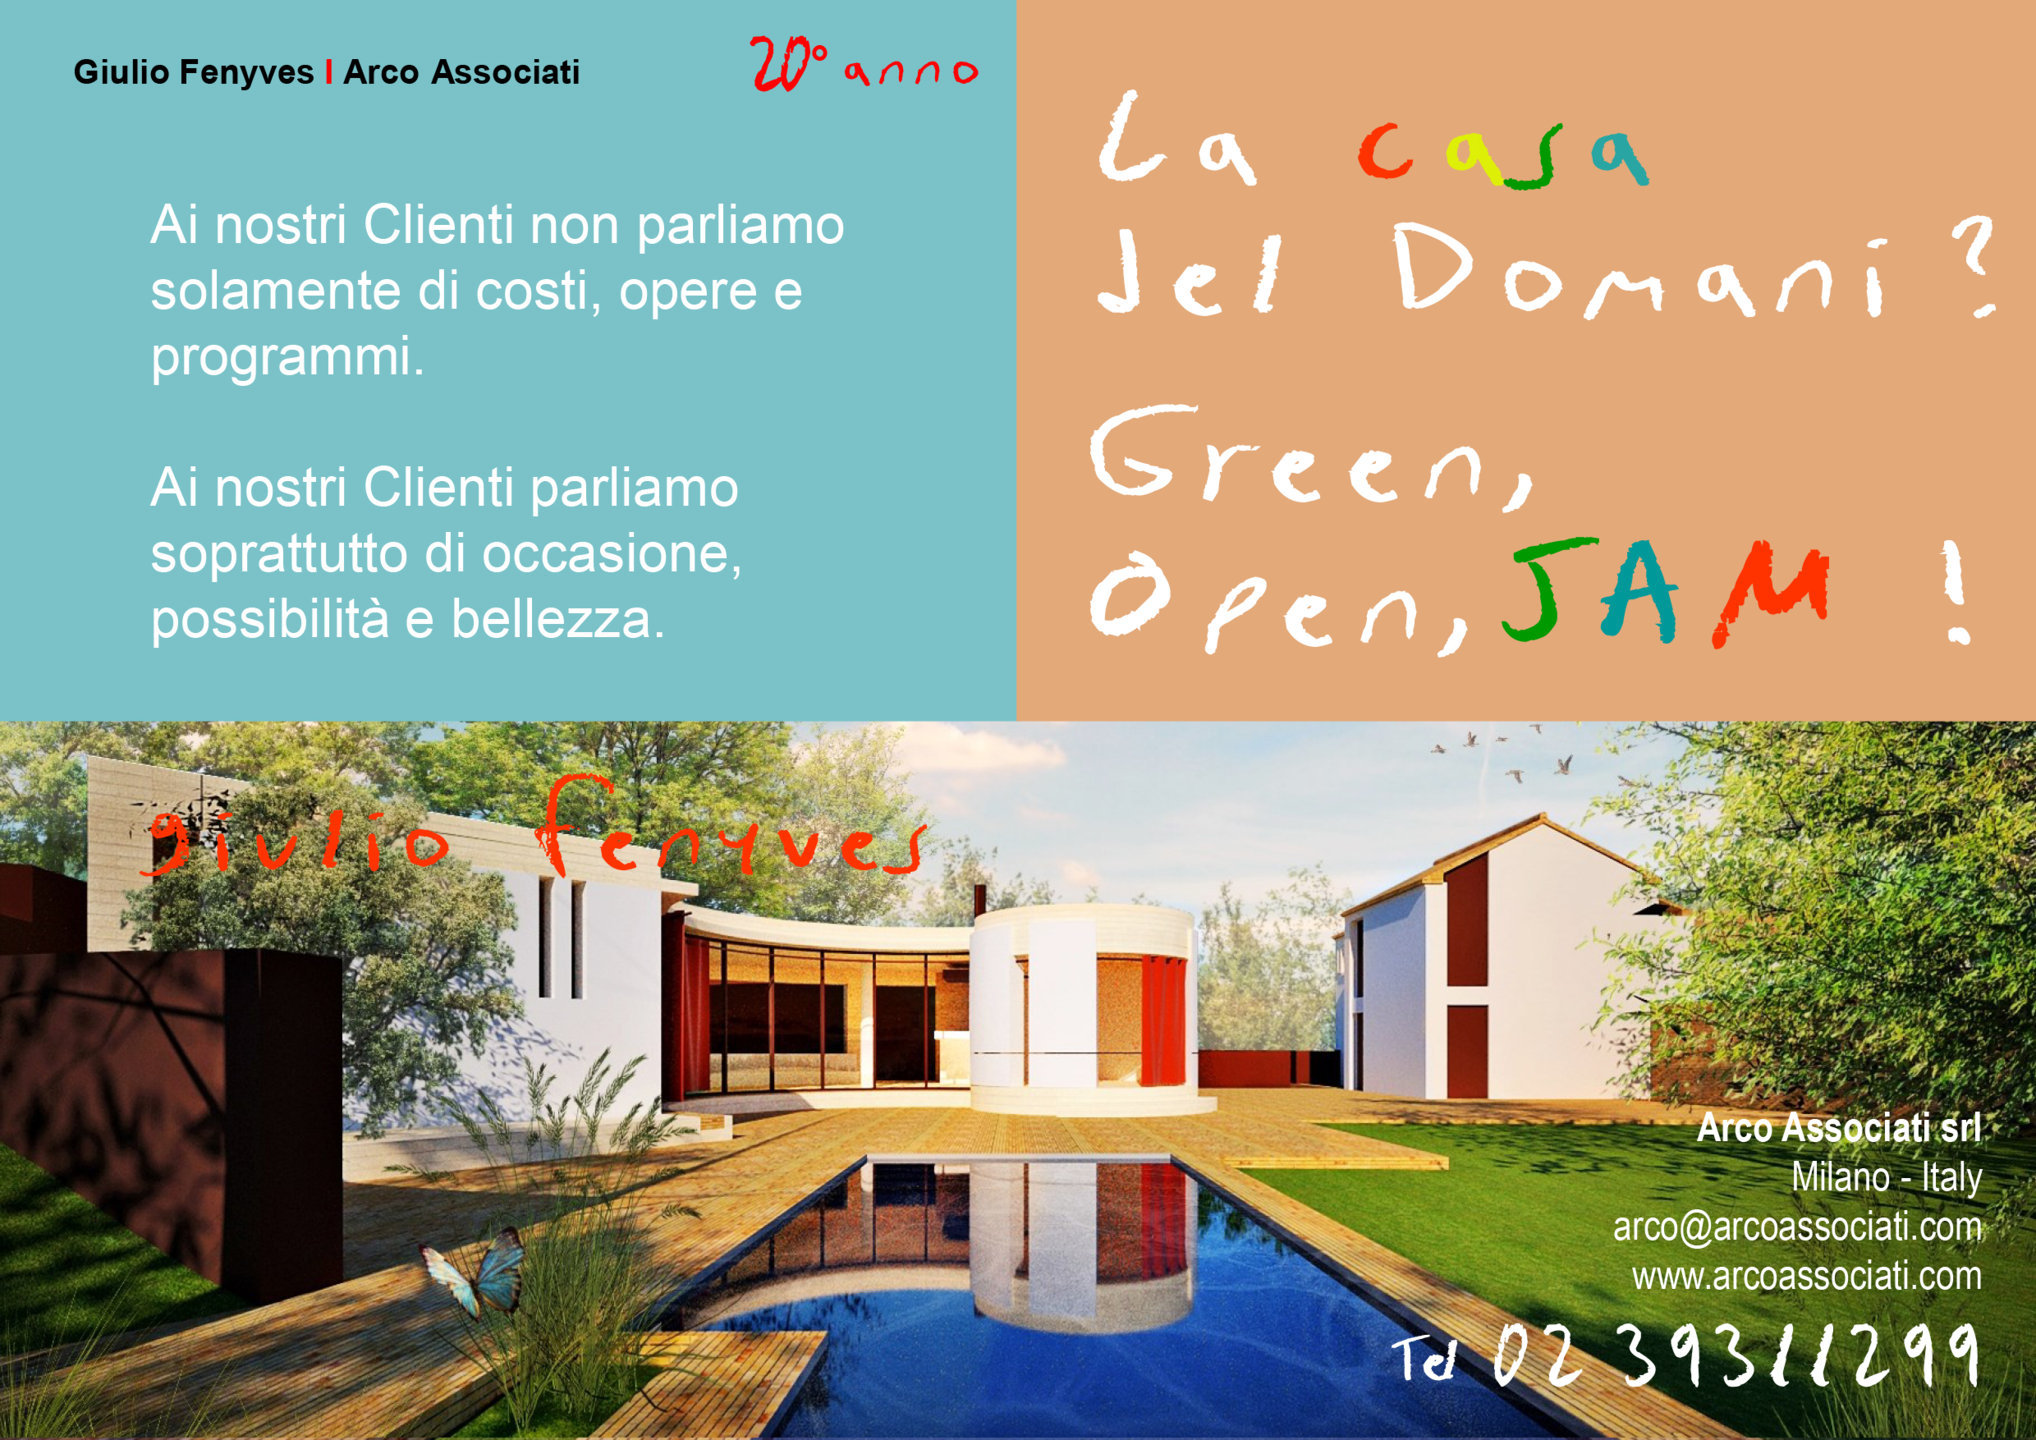 Arco Associati - La casa del domani? Green, Open, JAM!